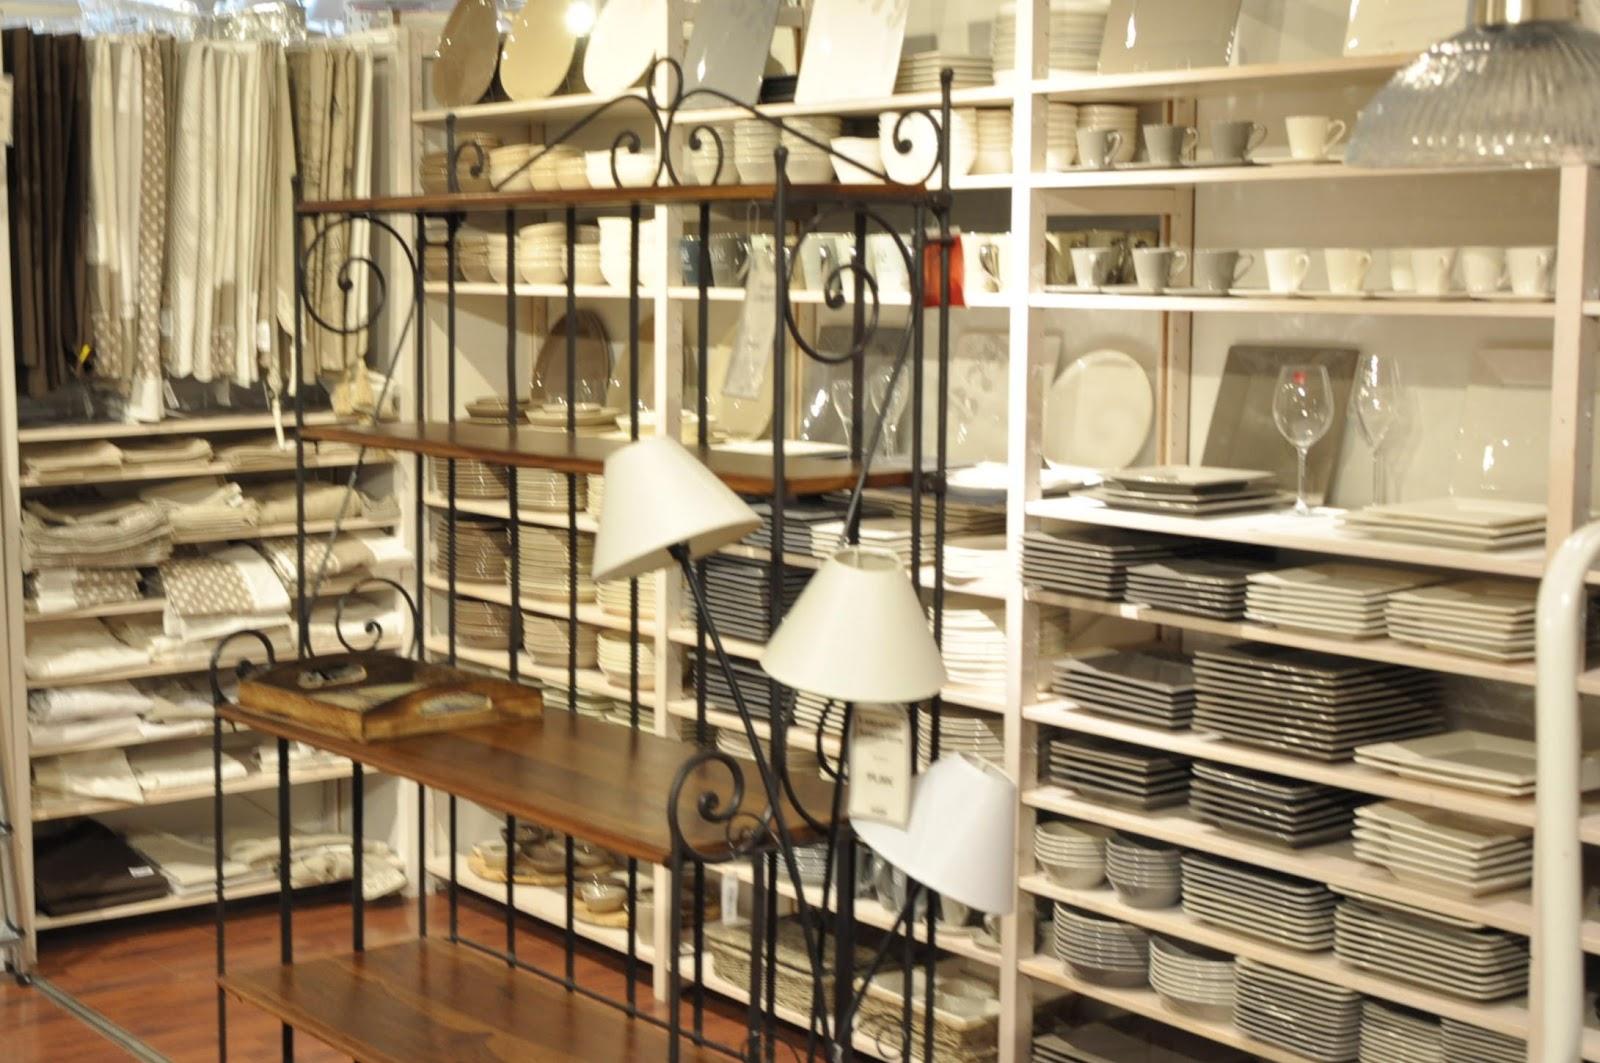 cool maison du monde vendenheim with maison du monde vendenheim. Black Bedroom Furniture Sets. Home Design Ideas